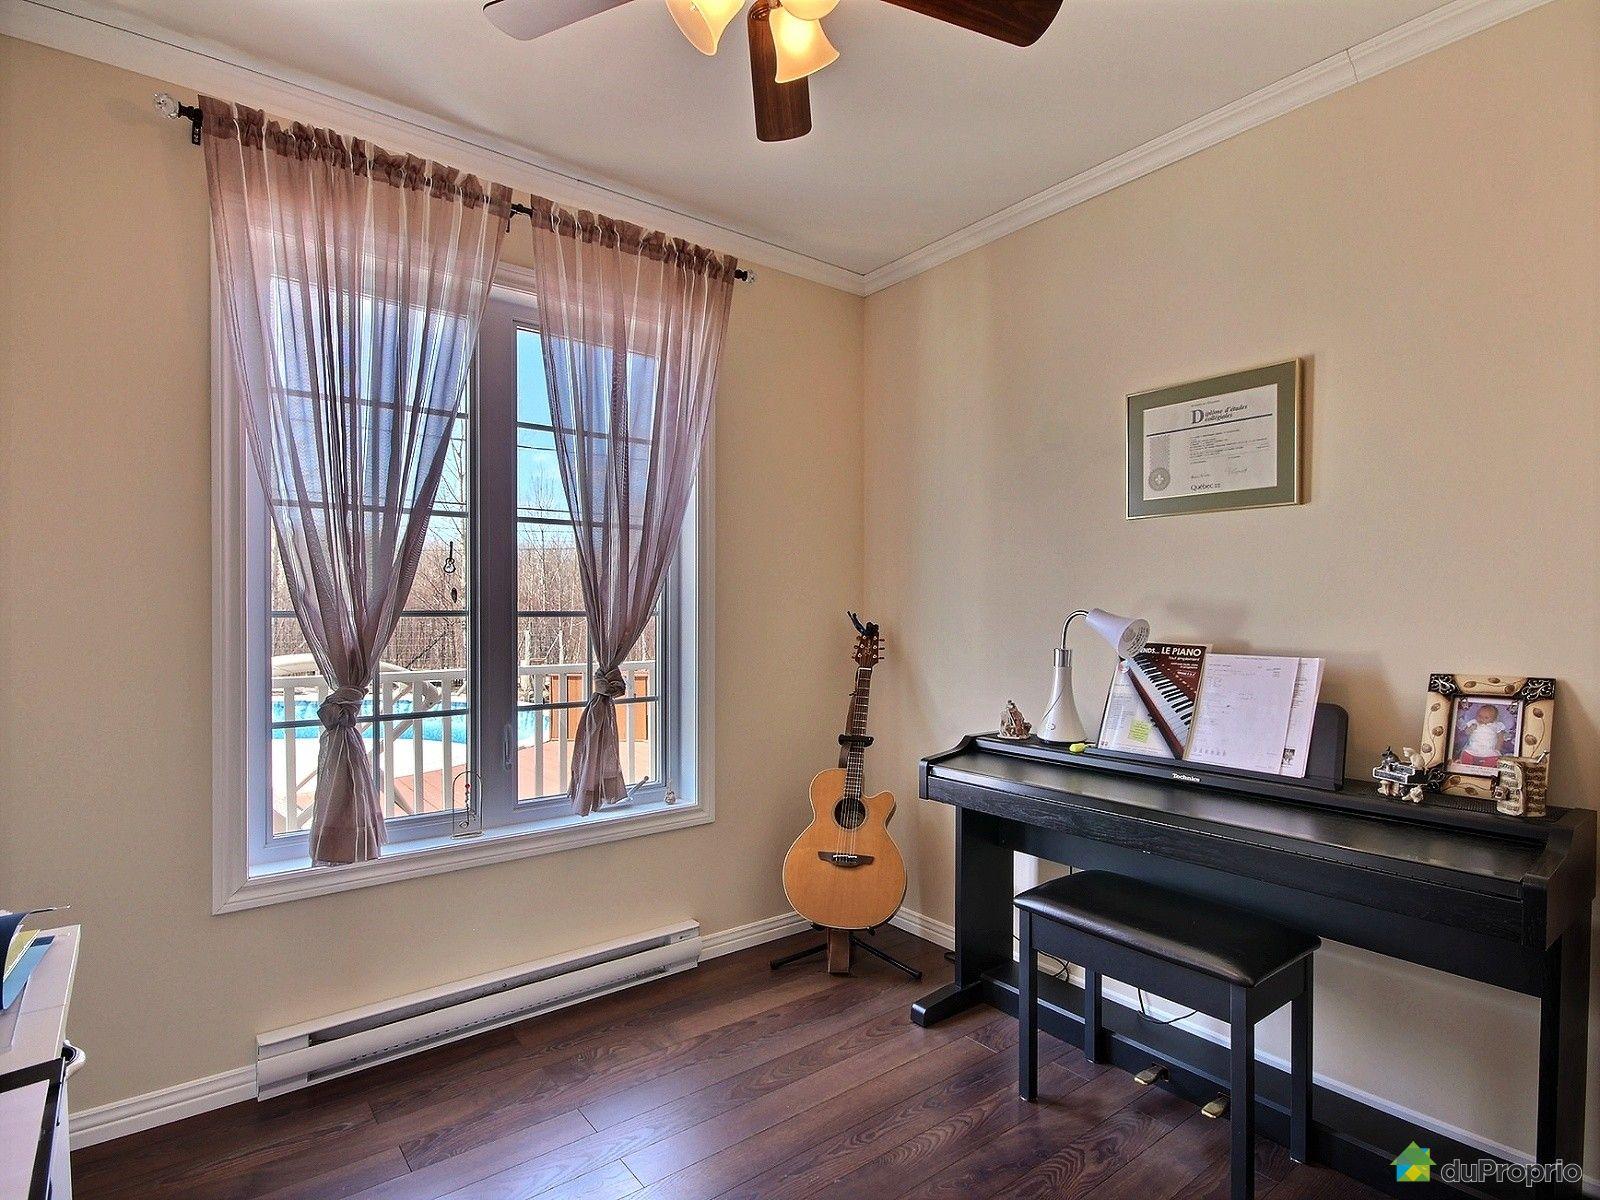 Maison vendre alma 250 avenue d 39 iberville immobilier for Chambre a coucher alma